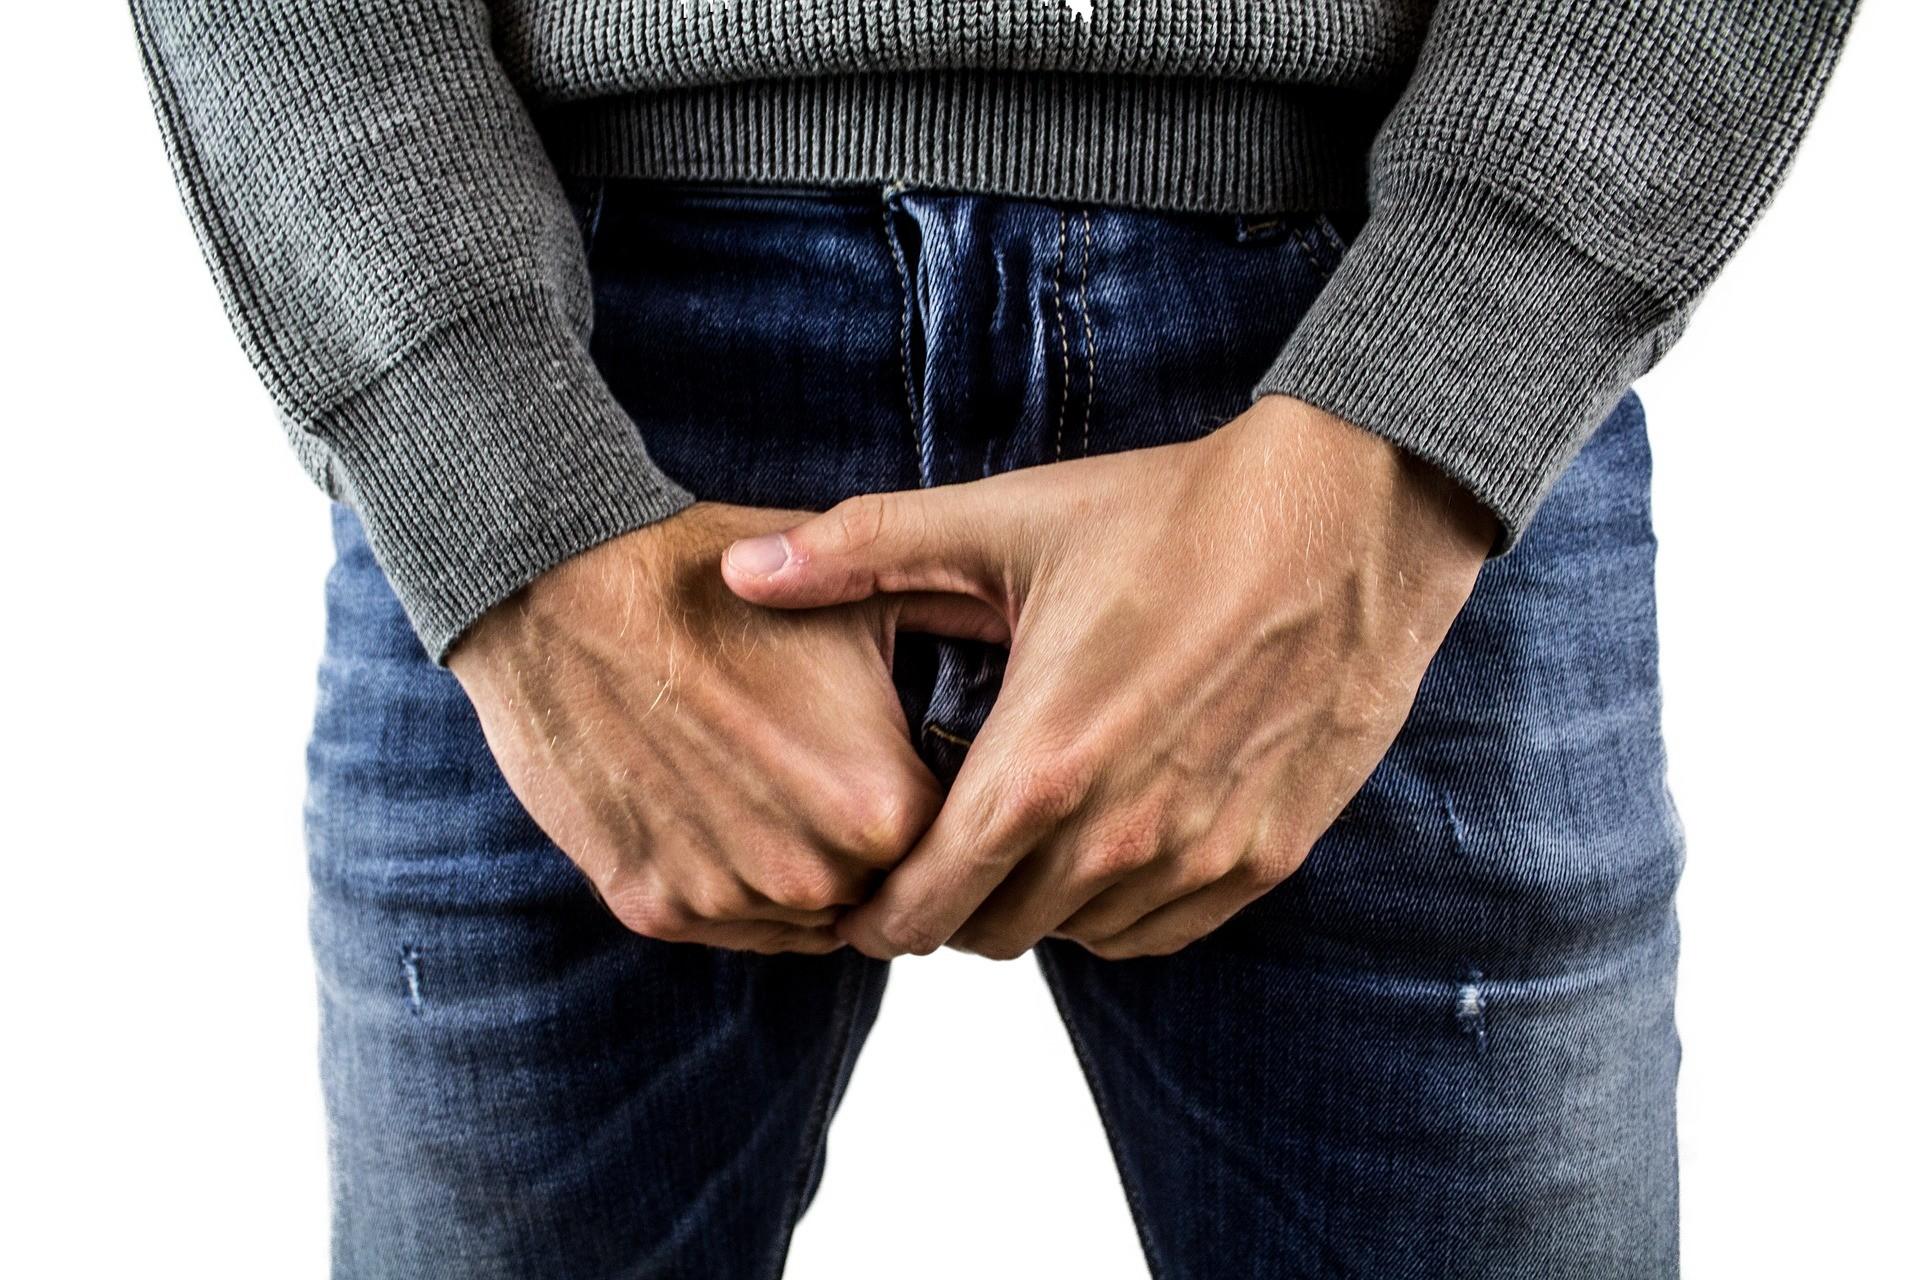 cáncer de próstata con psa insignificante